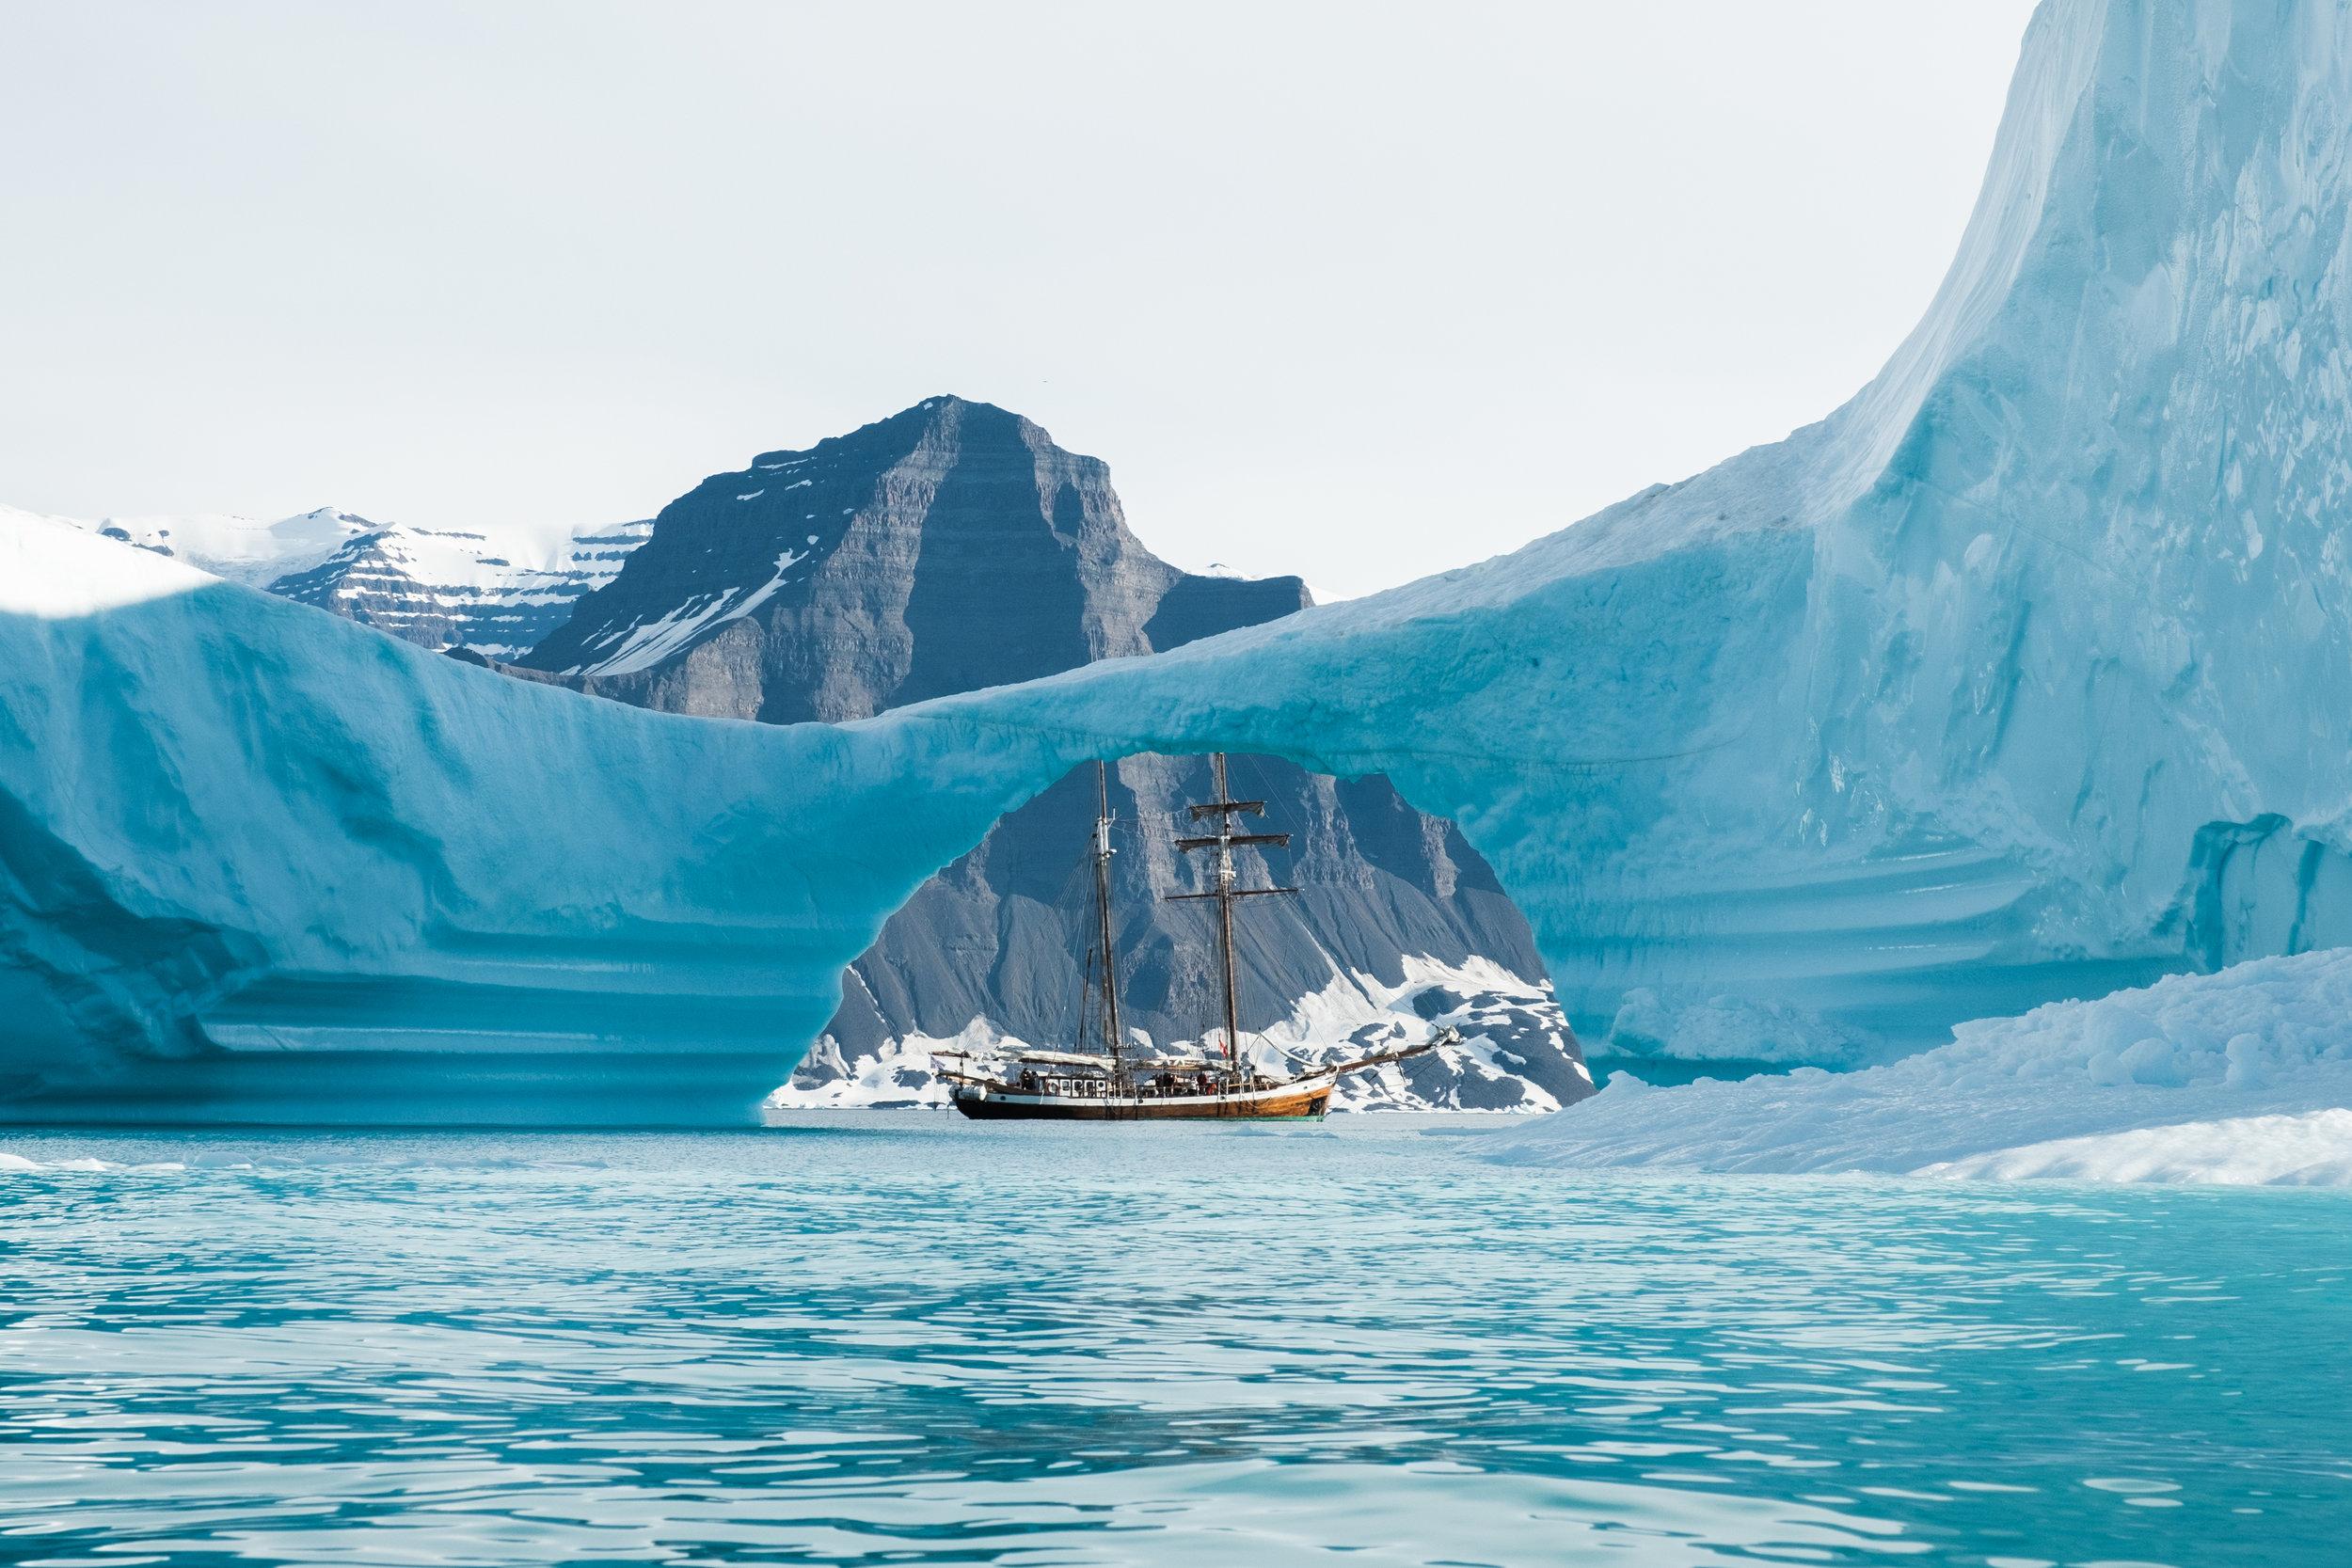 benjamin-hardman-iceland-DSCF6987.jpg